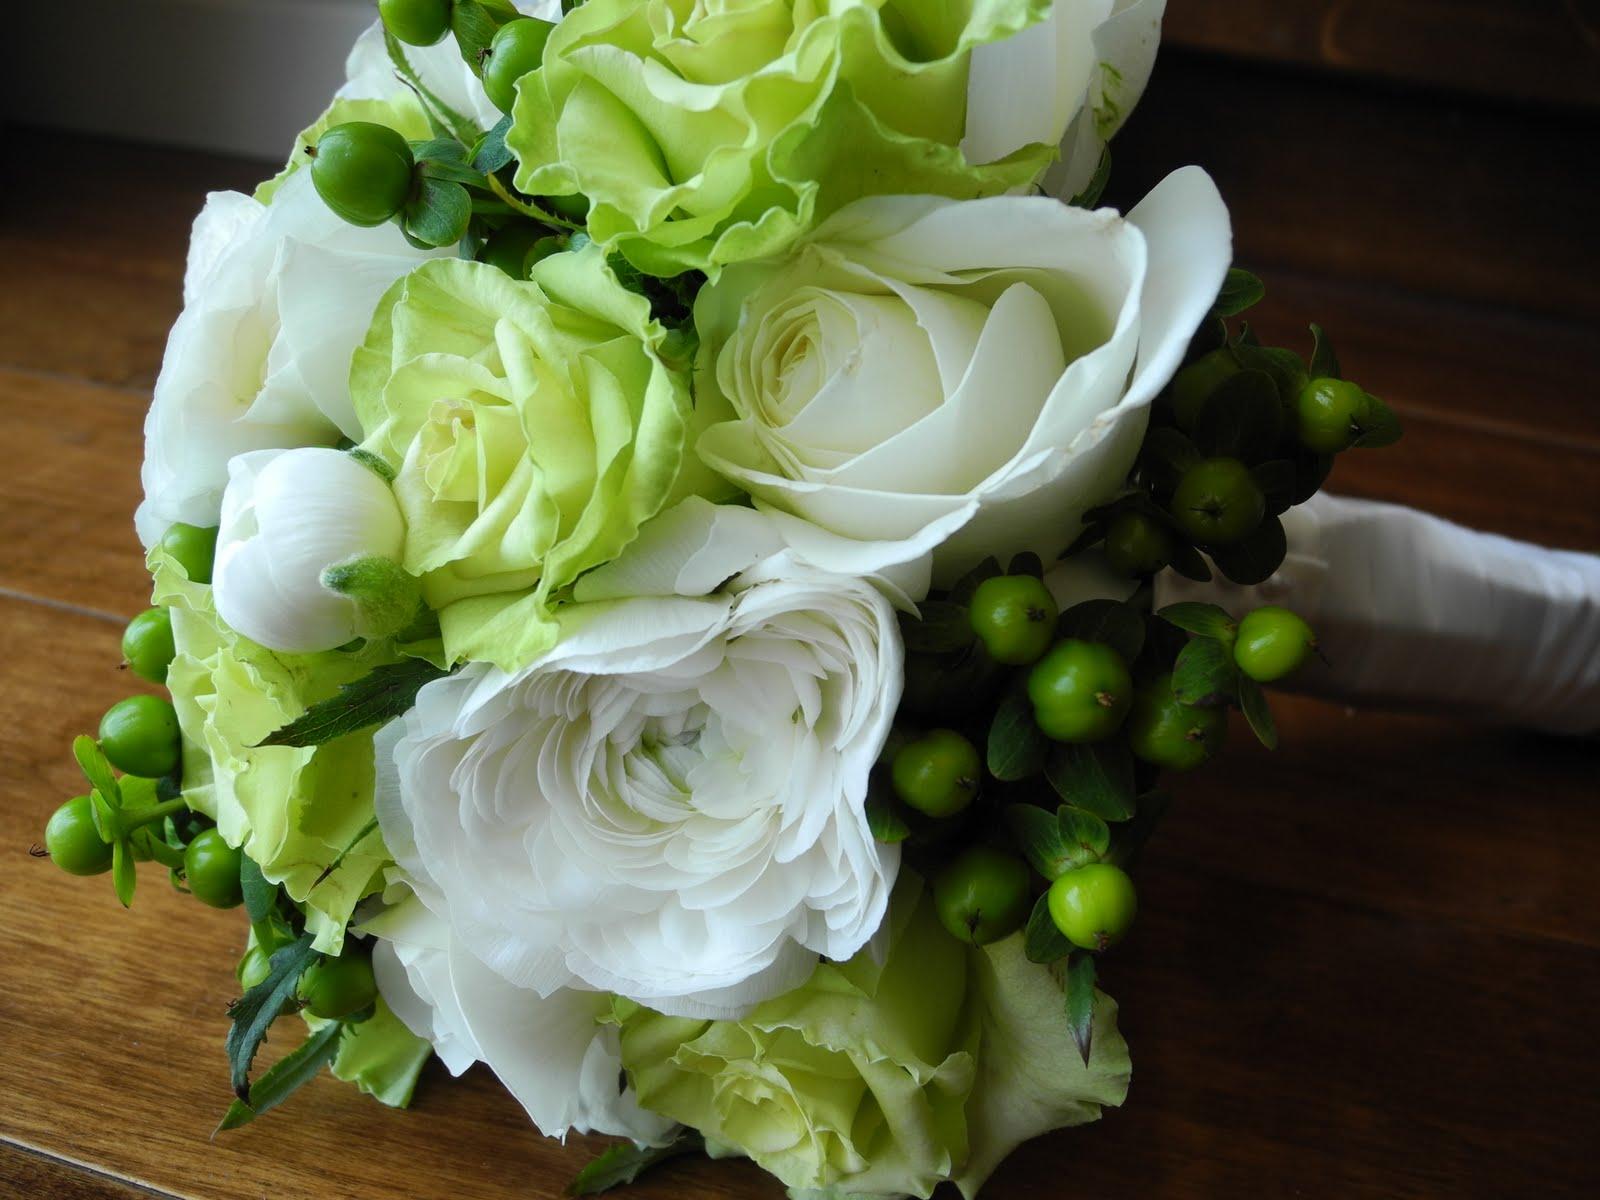 Chebrias blog elegant green wedding bouquet green wedding bouquets the brides bouquet cream mightylinksfo